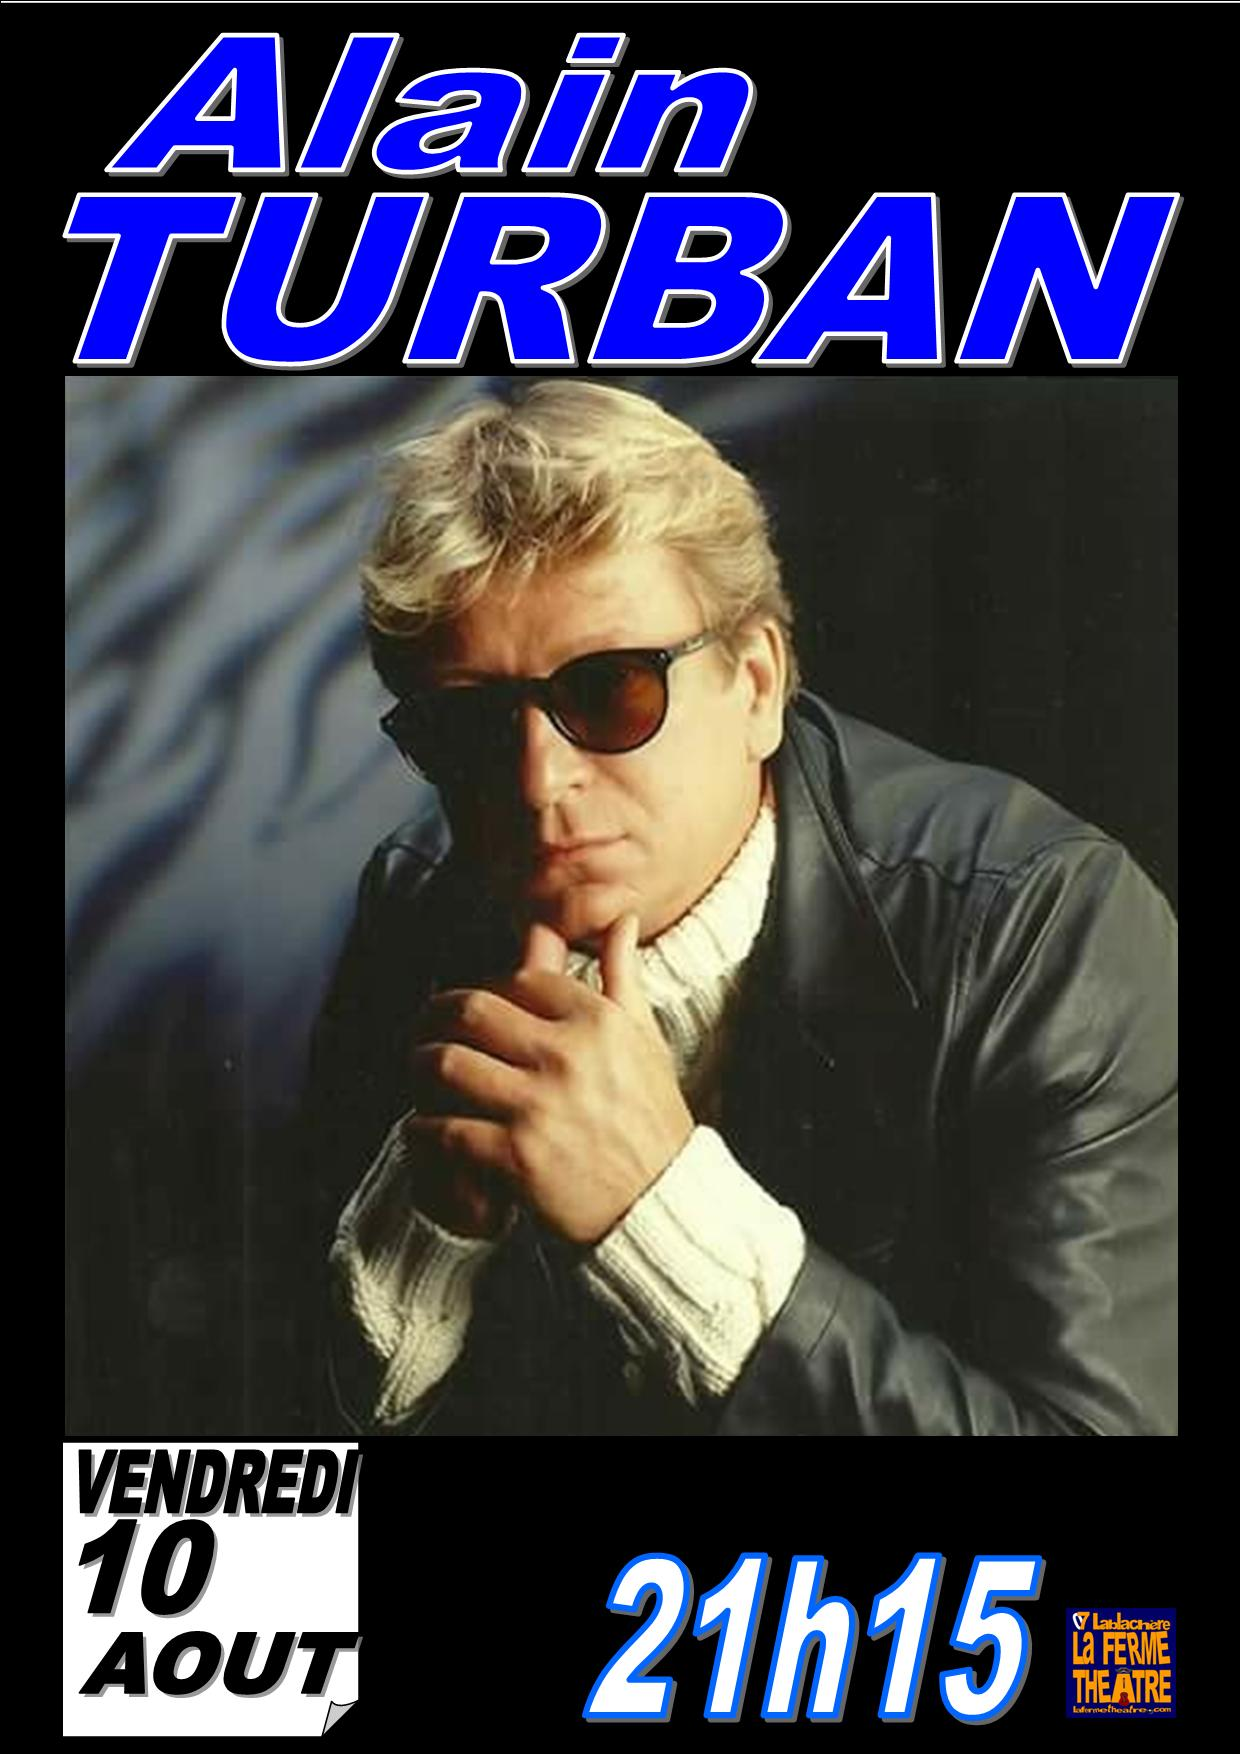 20180810 turban